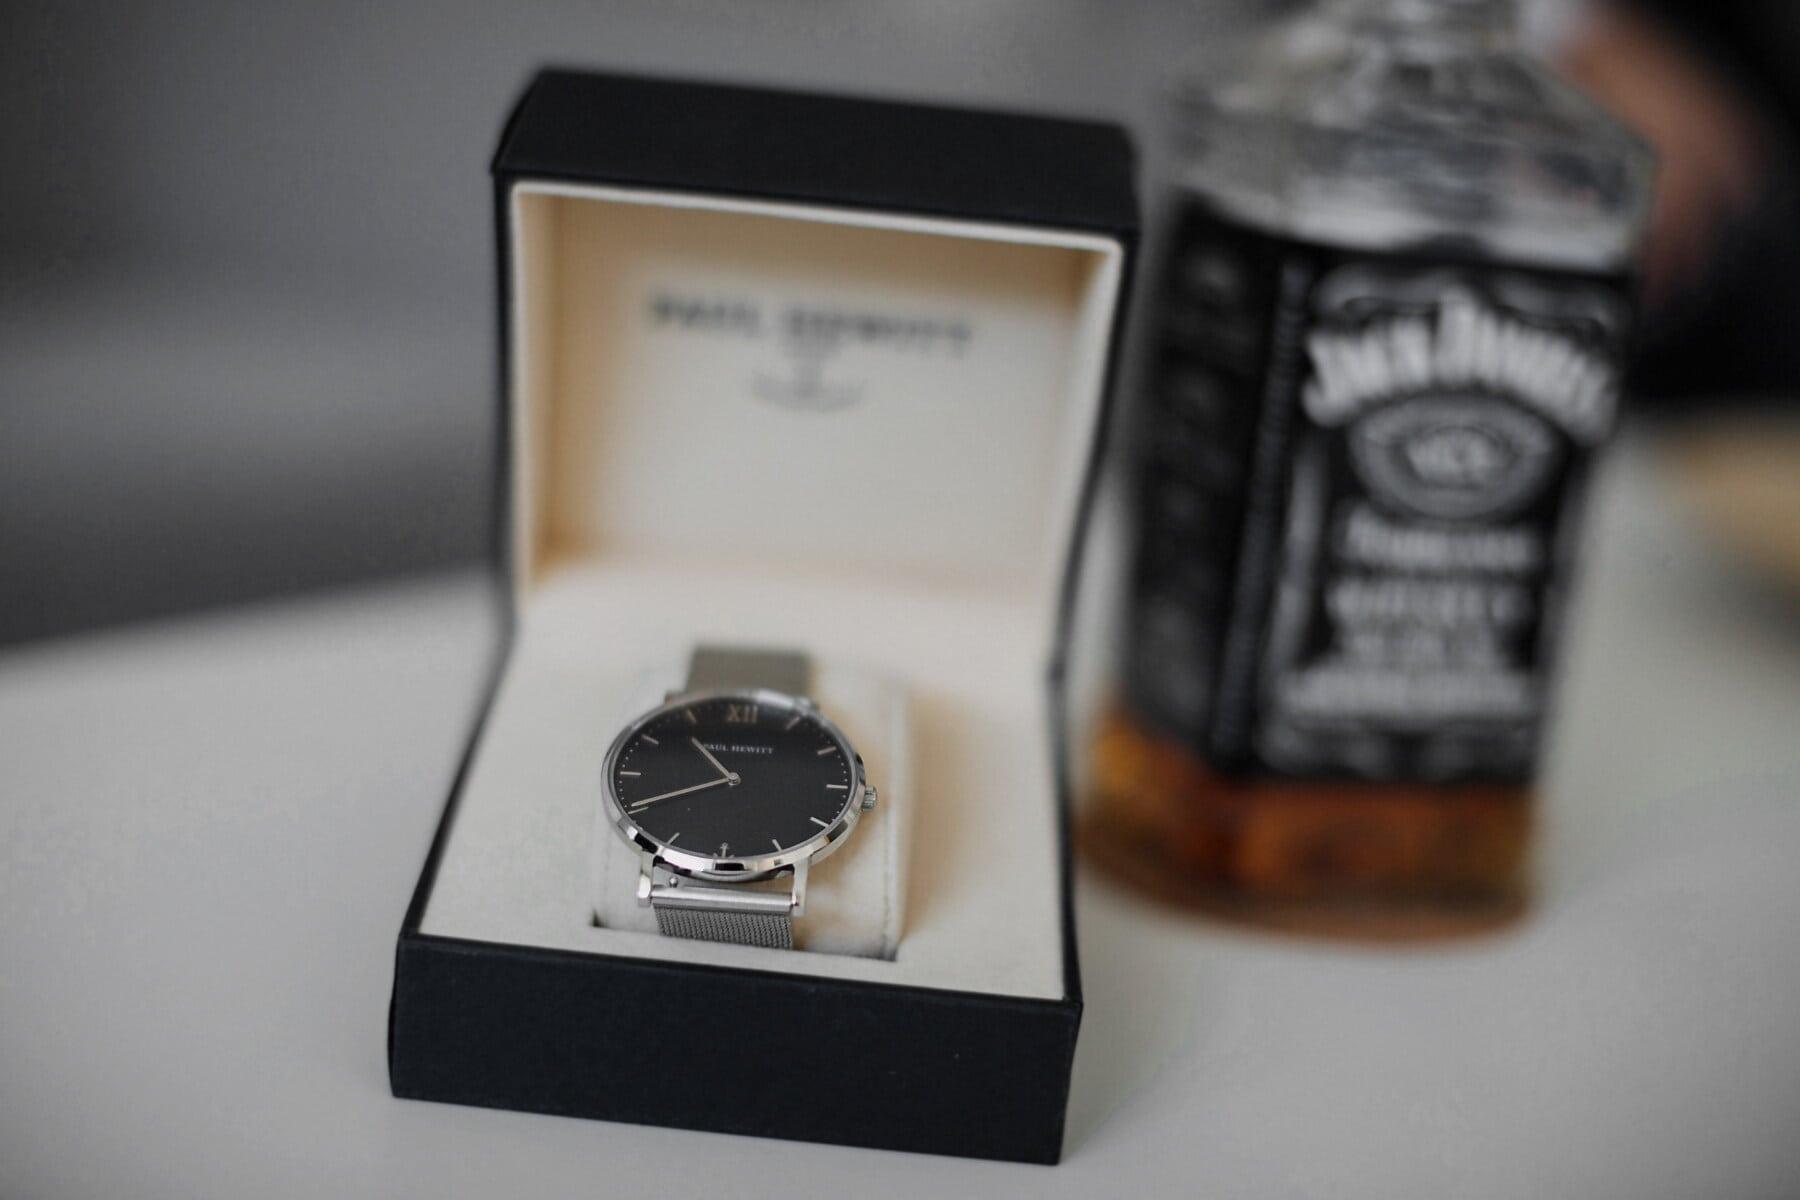 analog clock, gift, expensive, wristwatch, box, platinum, close-up, silver, indoors, precision